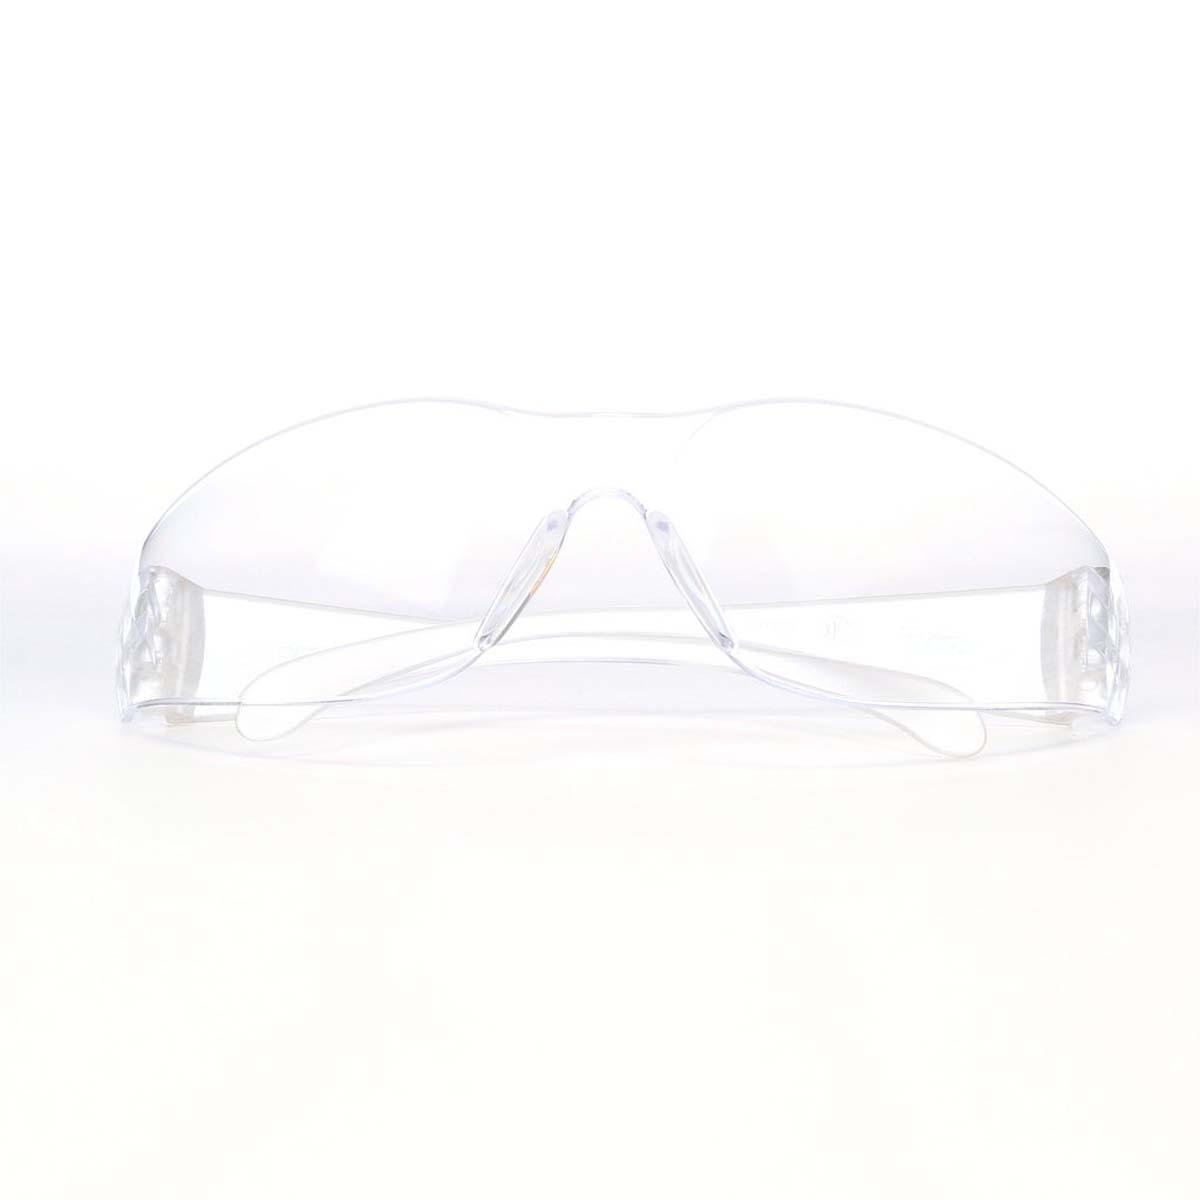 3M Virtua Protective Eyewear 11326-00000-100 Clear Temples Clear Hard Coat Lens